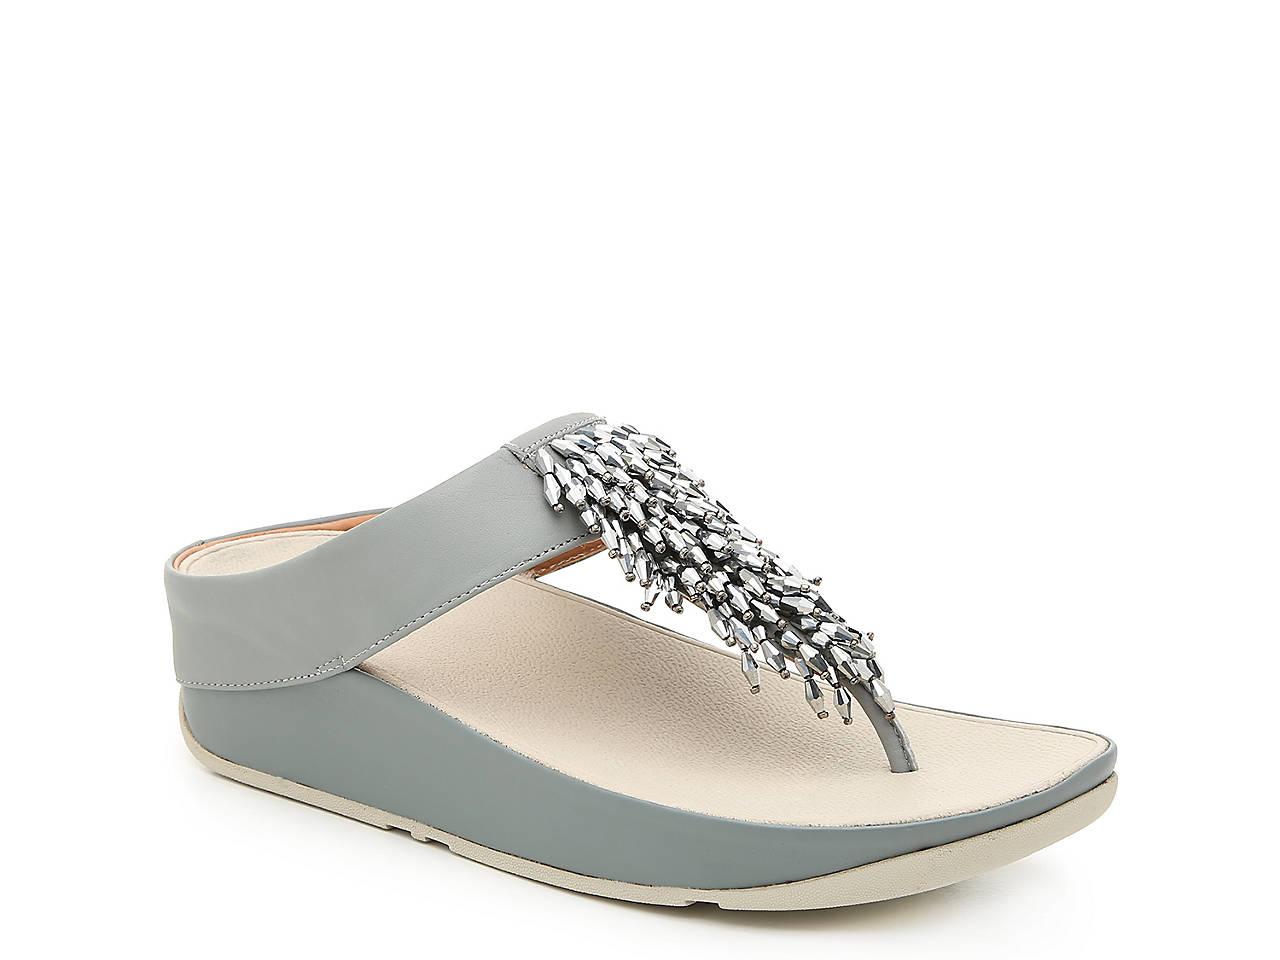 7b0d9bde5d72 FitFlop Rumba Wedge Sandal Women s Shoes